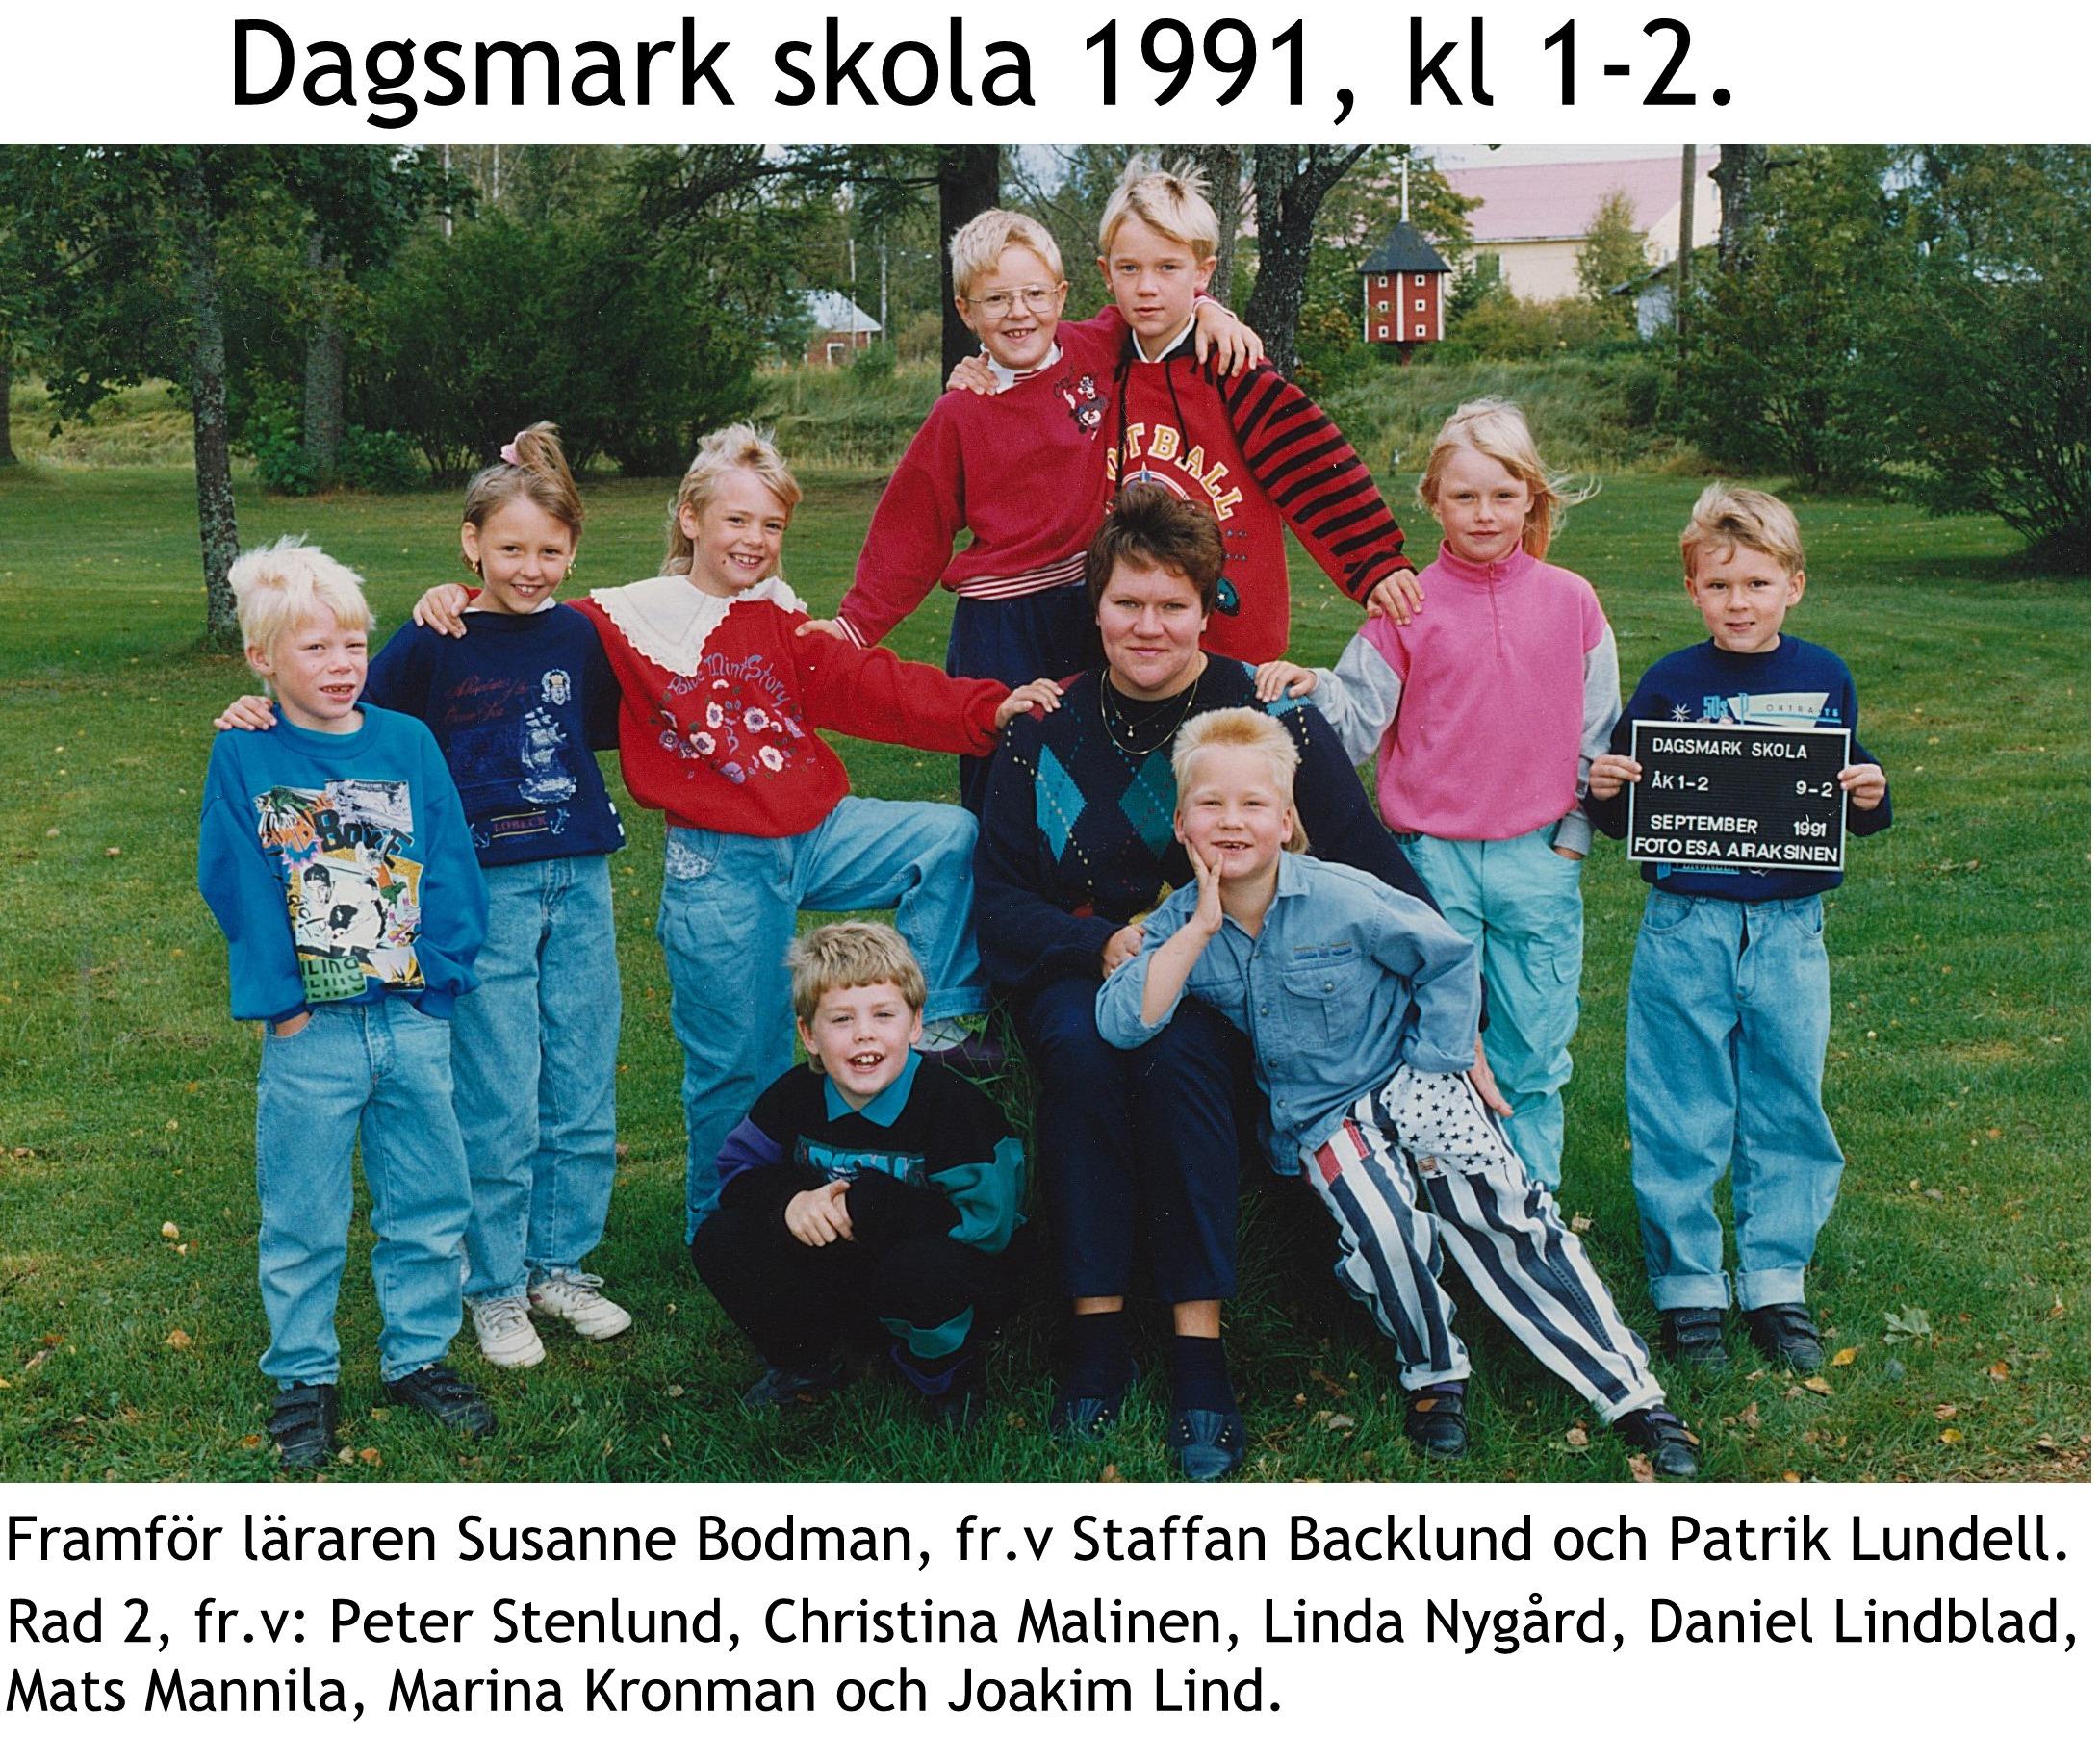 1991 Dagsmark skola kl 1-2